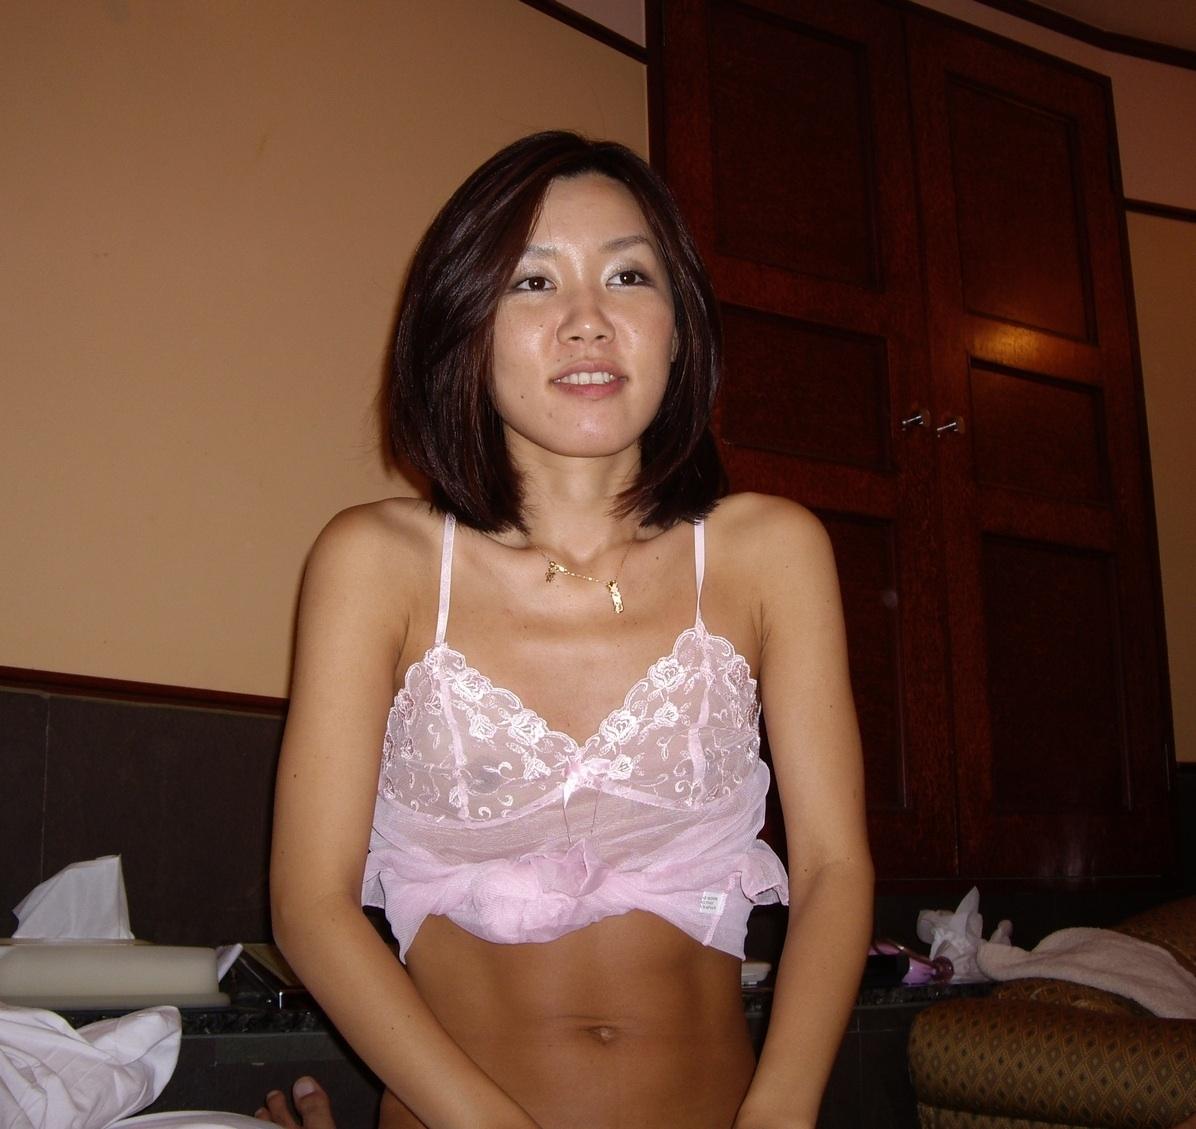 YAMIDAS 人妻 出典 file.blog.fc2.com